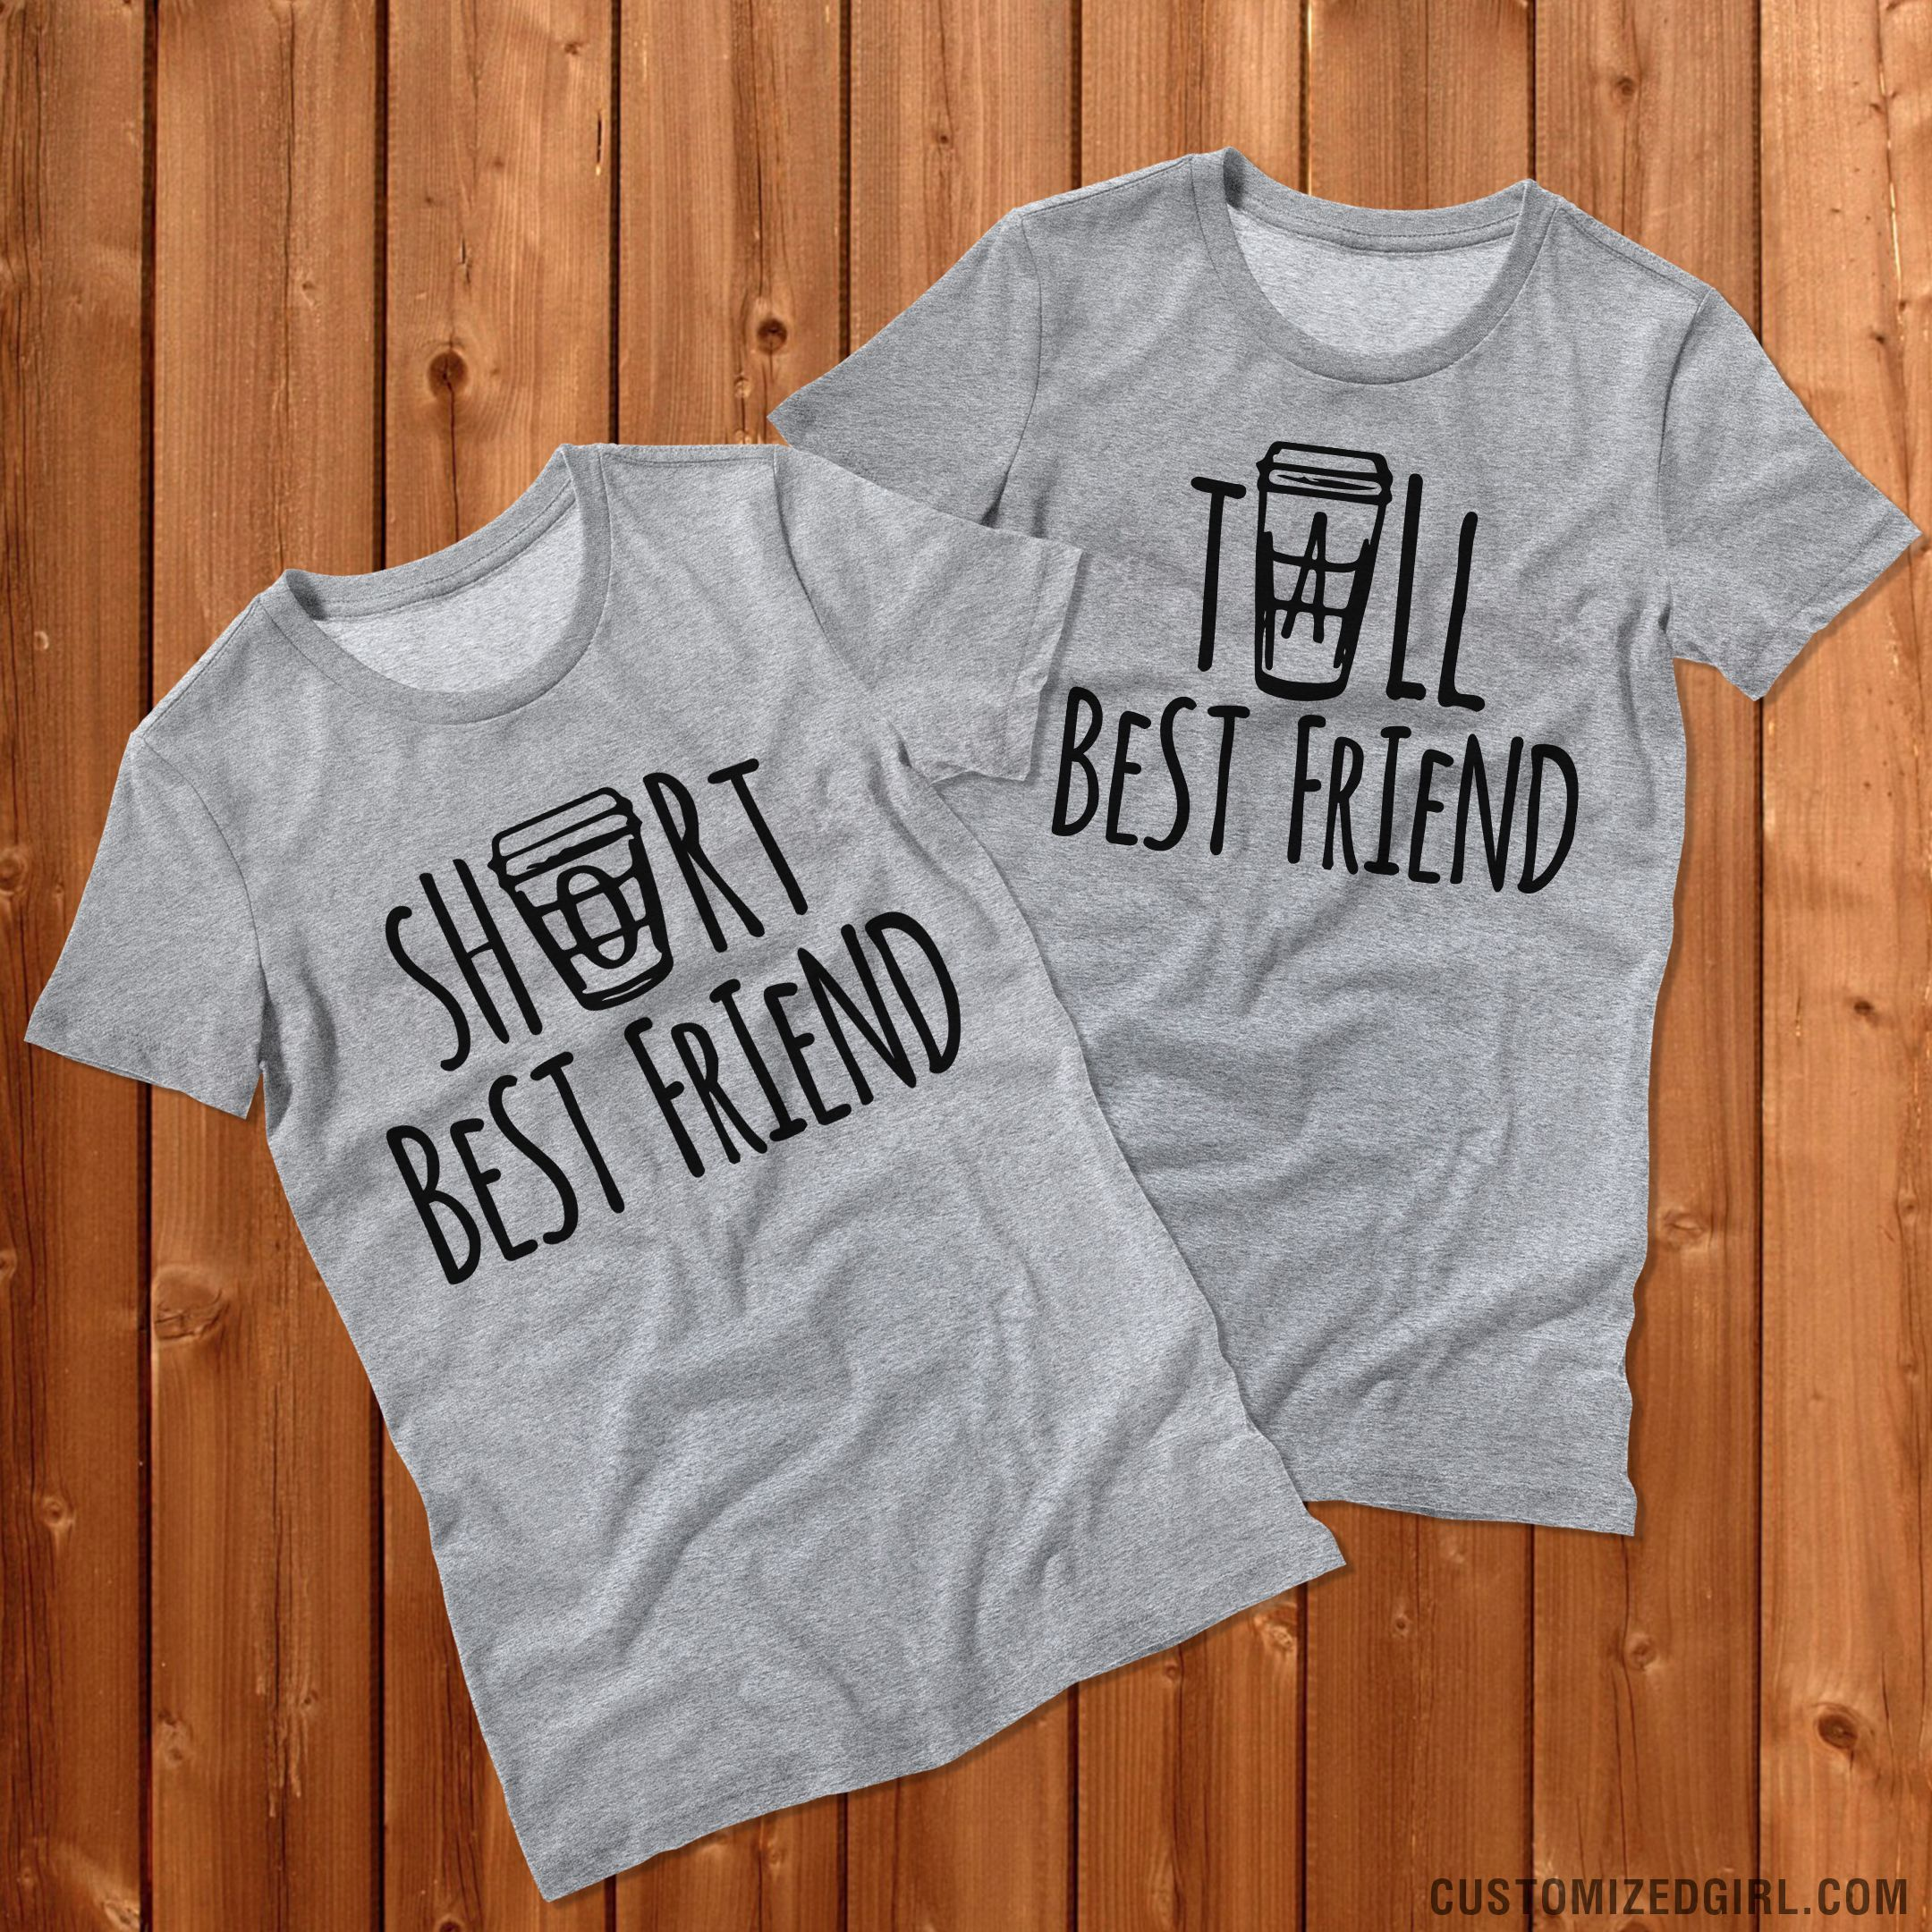 Tall Coffee Best Friend - Matching best friend shirts. Tall best friend and  short best friend. #starbucks #coffee #bffshirts